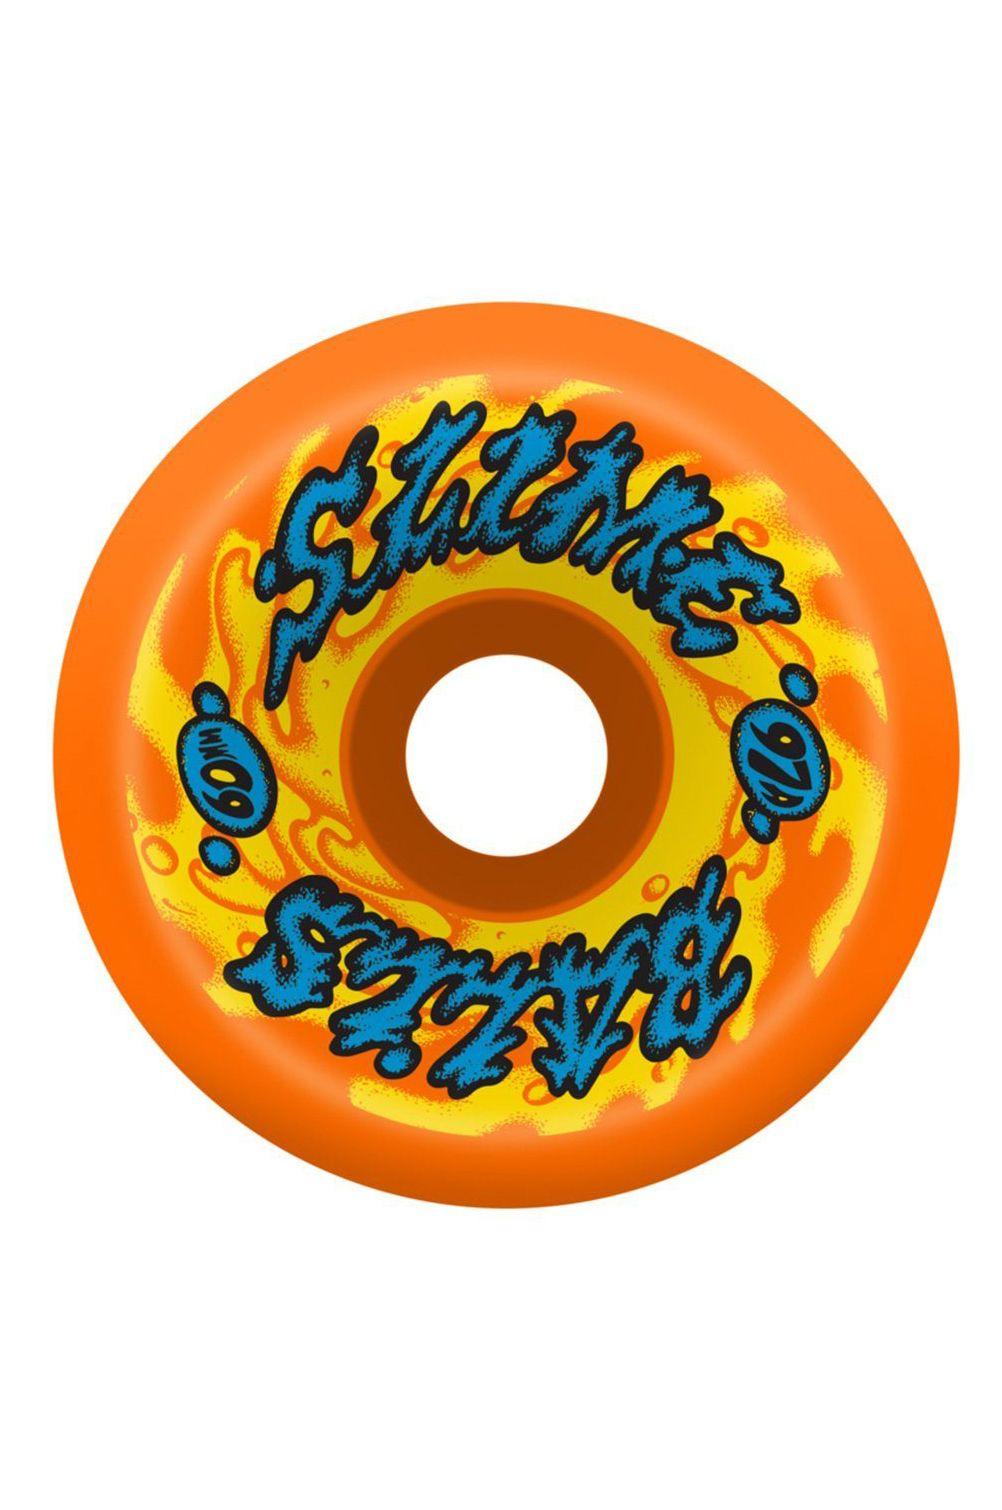 Slime Balls Skate Wheels 60MM GOOOBERZ VOMITS ORANGE 97A Assorted